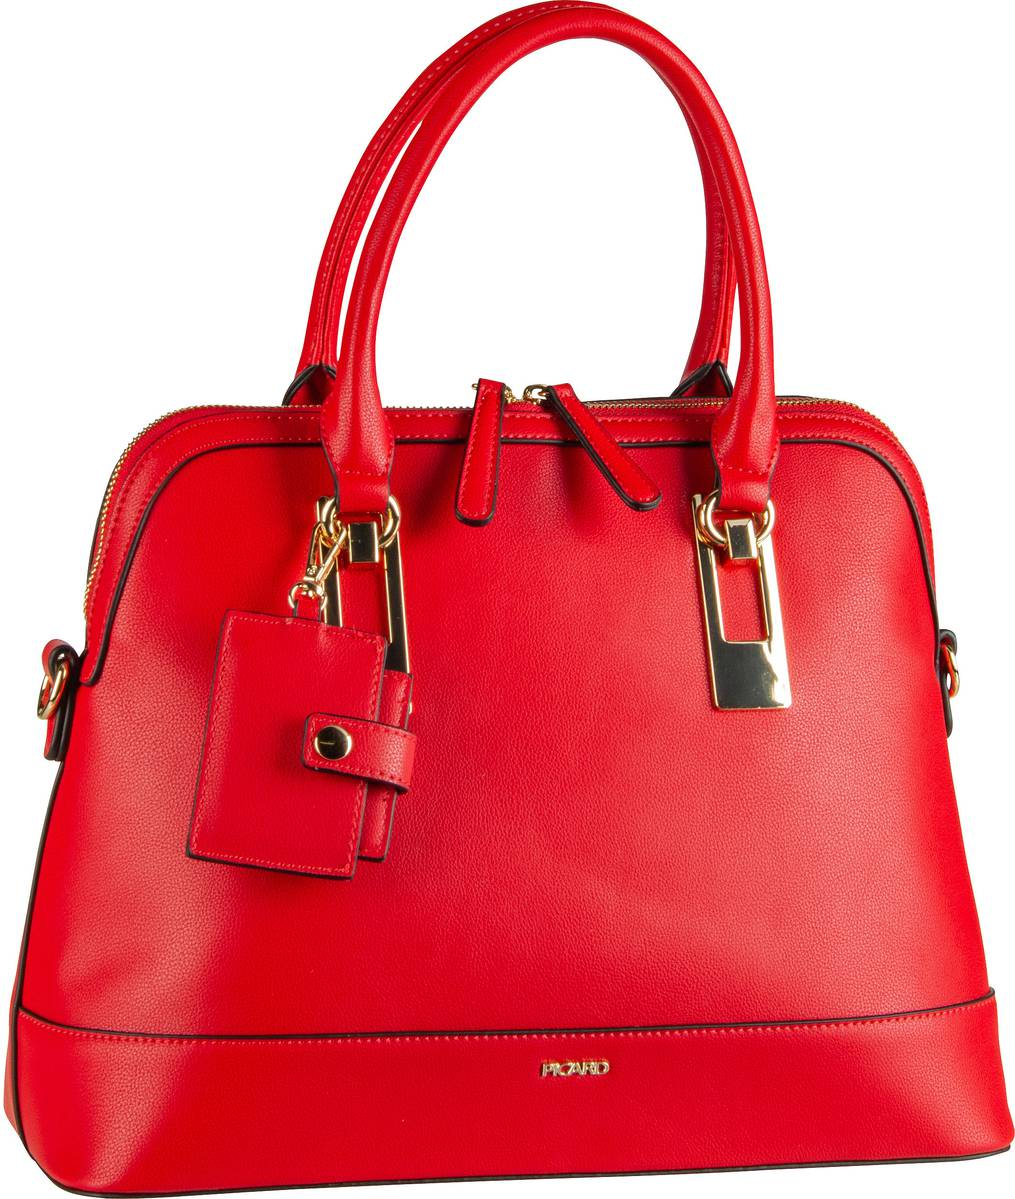 Handtasche Missis 2576 Amore